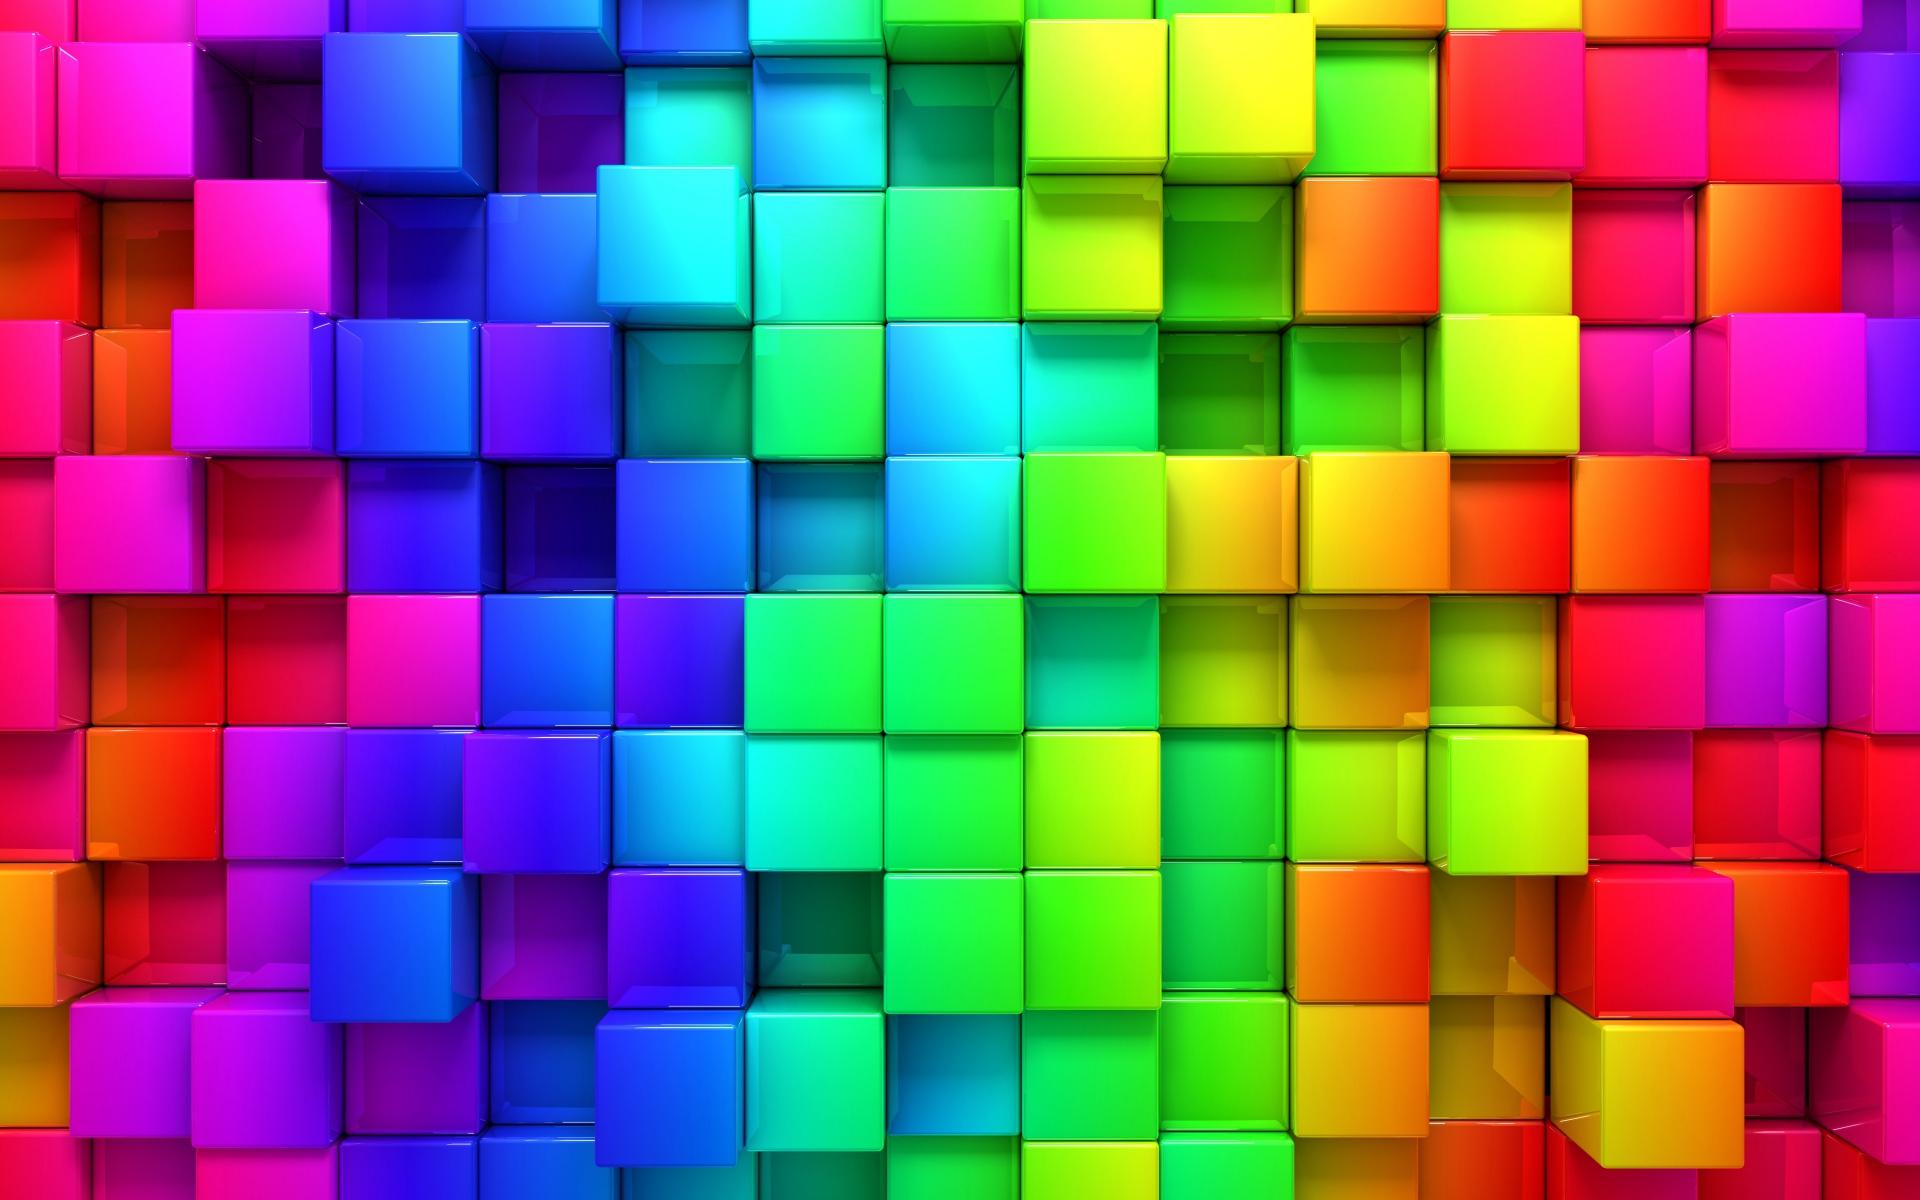 کاربرد رنگ در دکوراسیون و رنگ شناسی